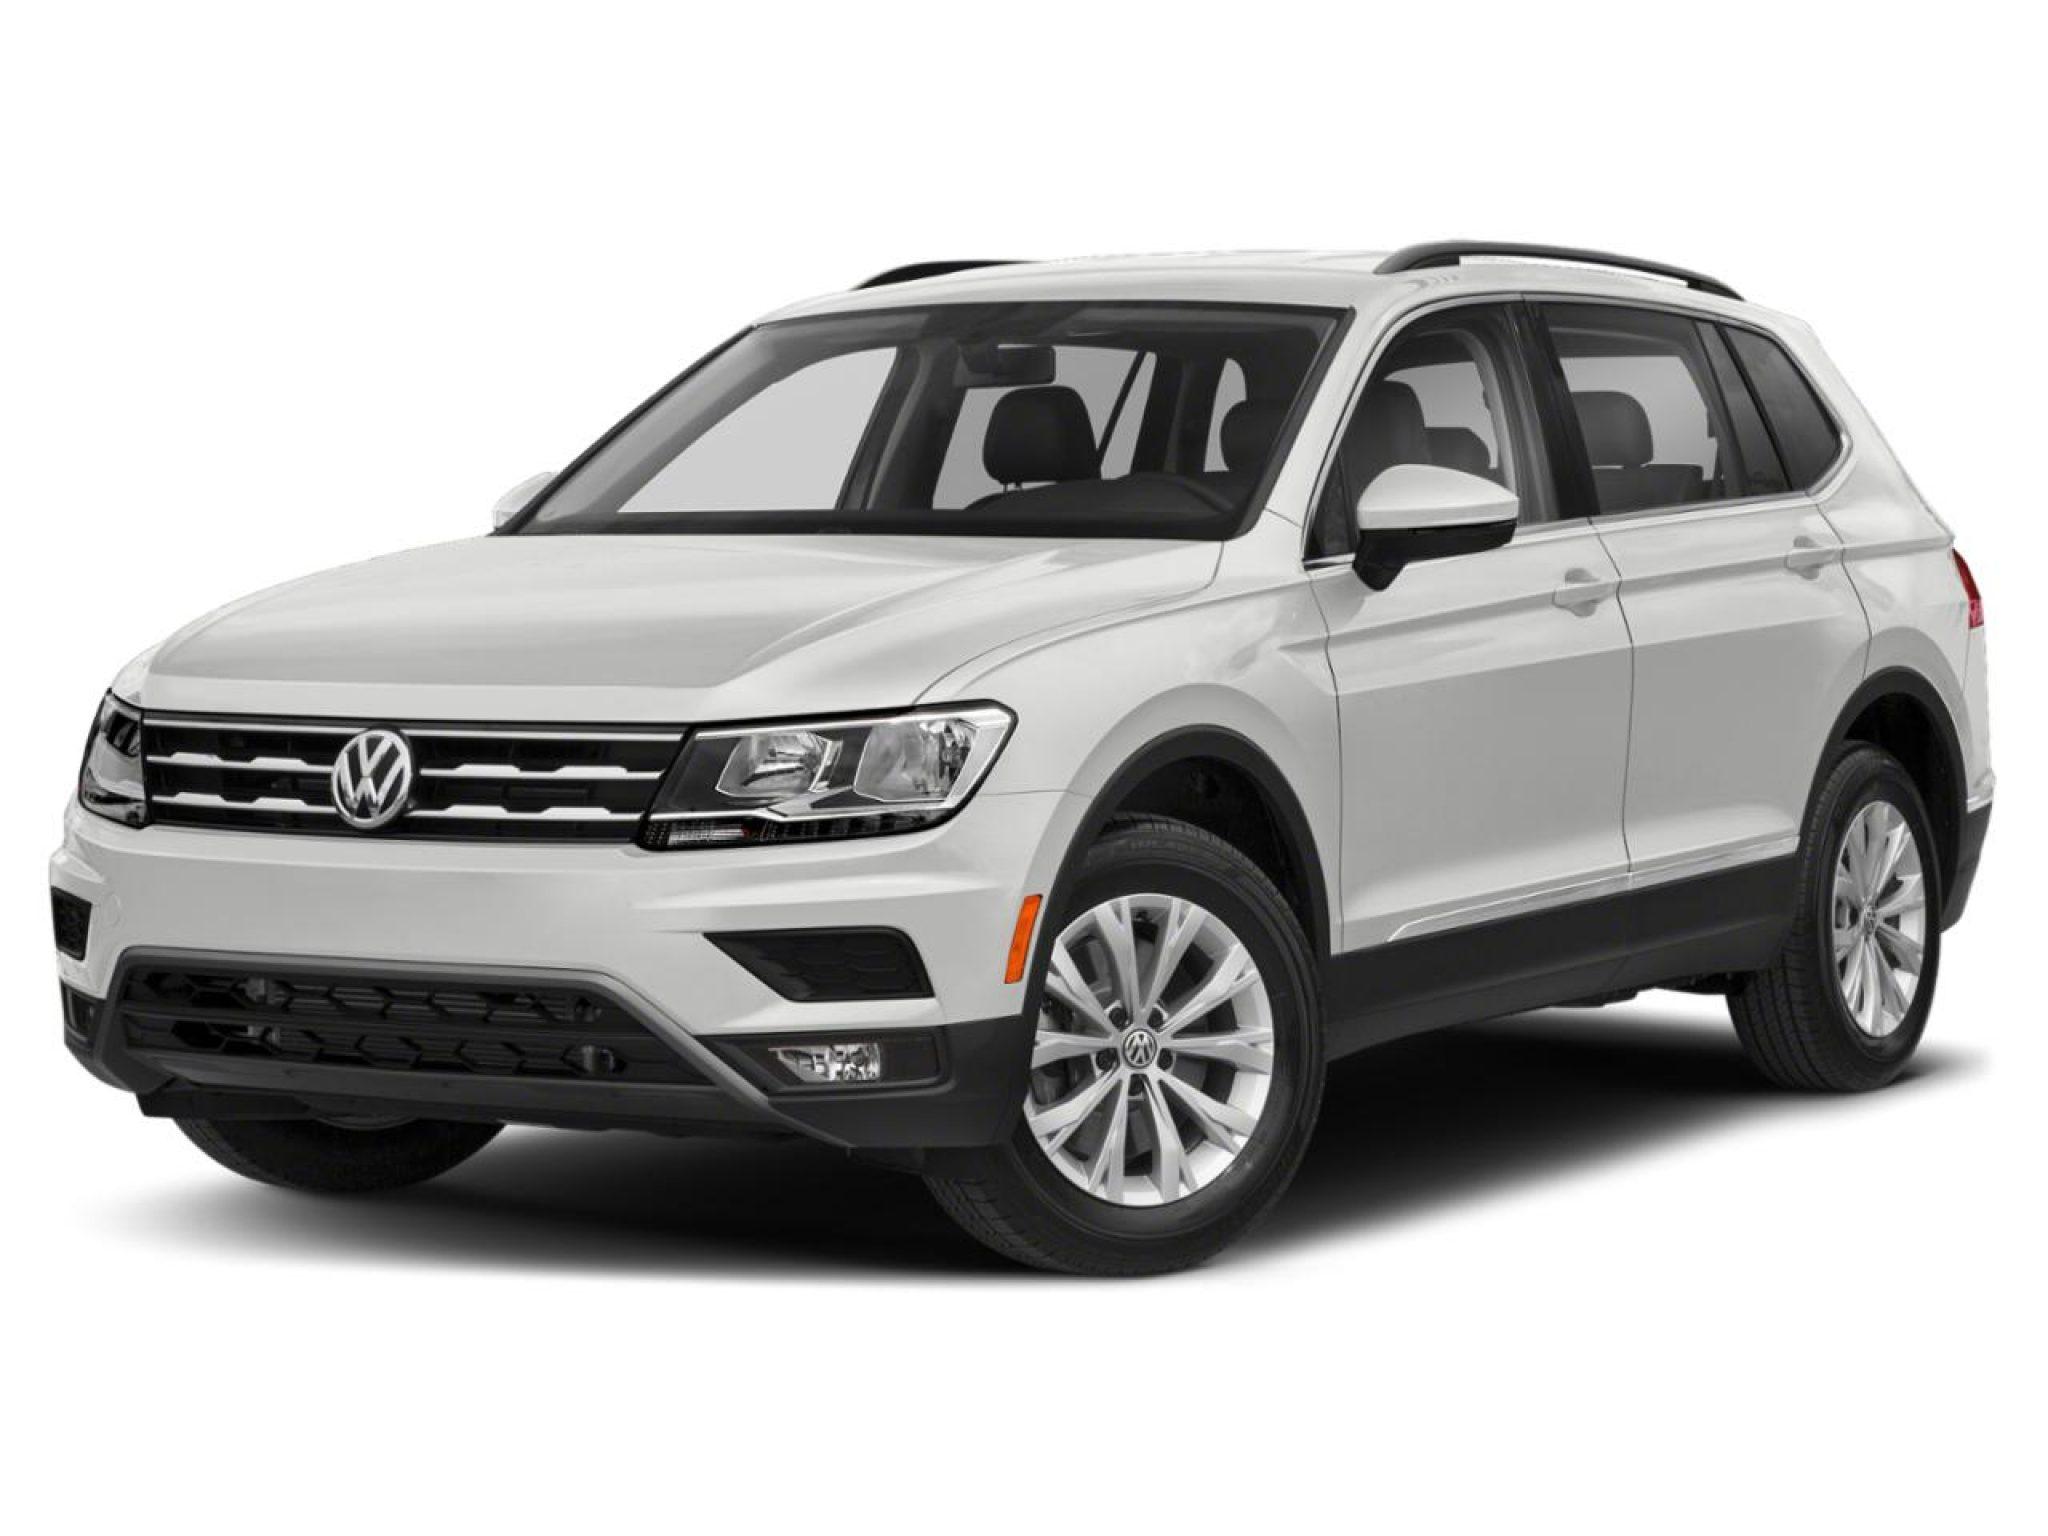 Volkswagen Tiguan SE R-Line 2021 Price in South Africa